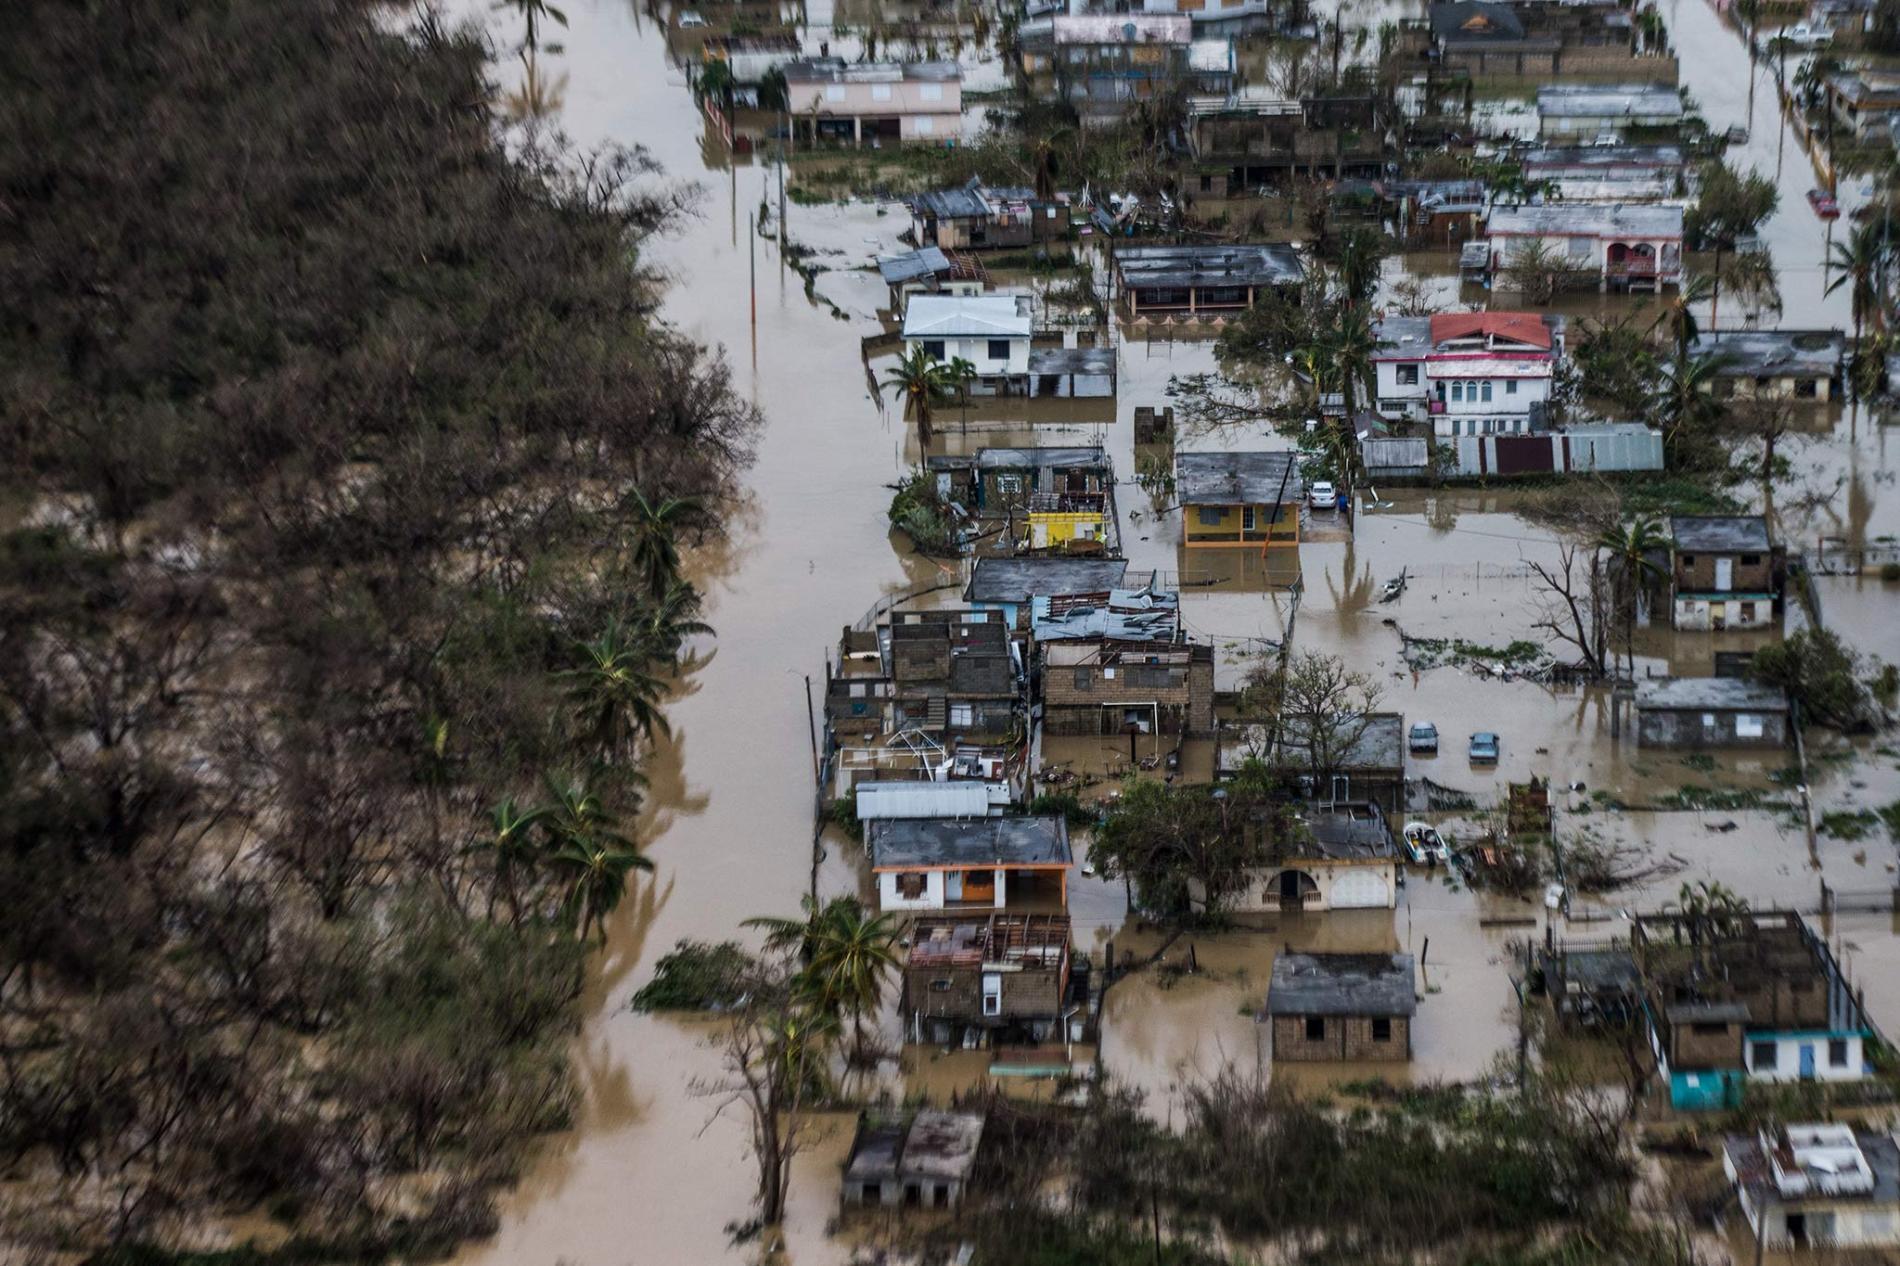 hurricane_maria_destruction_puerto_rico_01.ngsversion.1506345332495.adapt.1900.1.jpg